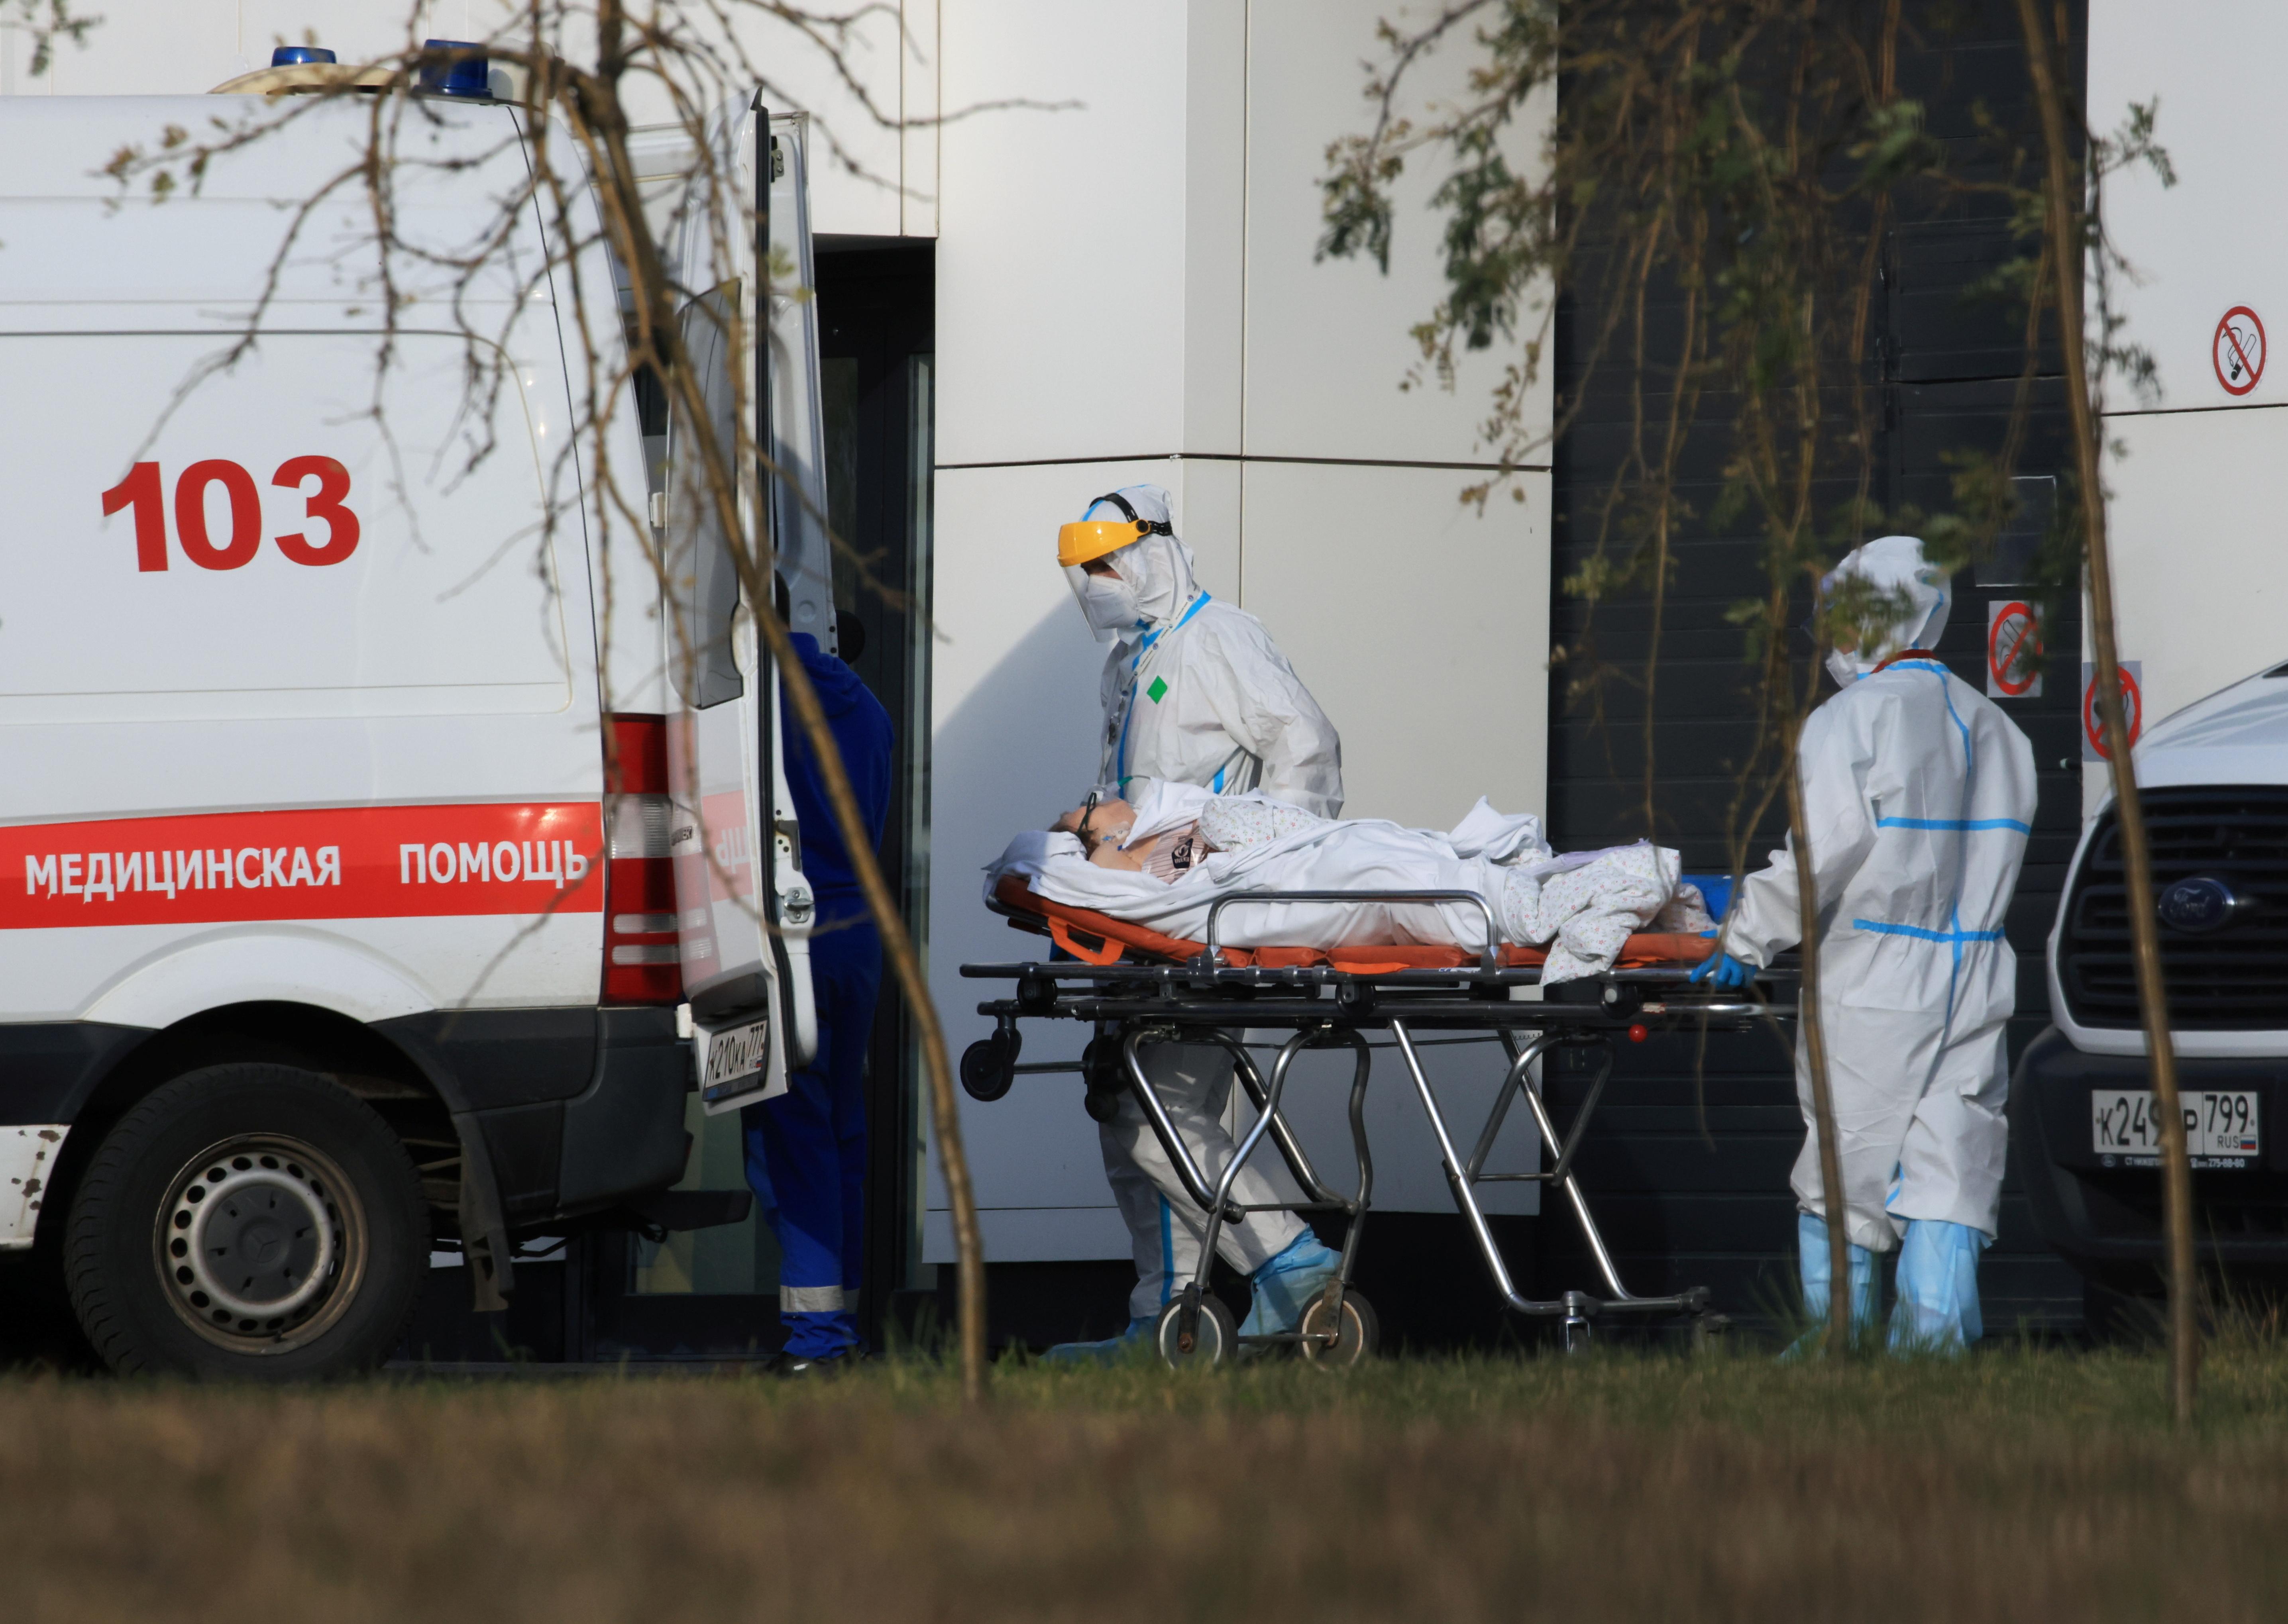 Putin Approves Week-Long Workplace Shutdown as Coronavirus Cases, Deaths Surge